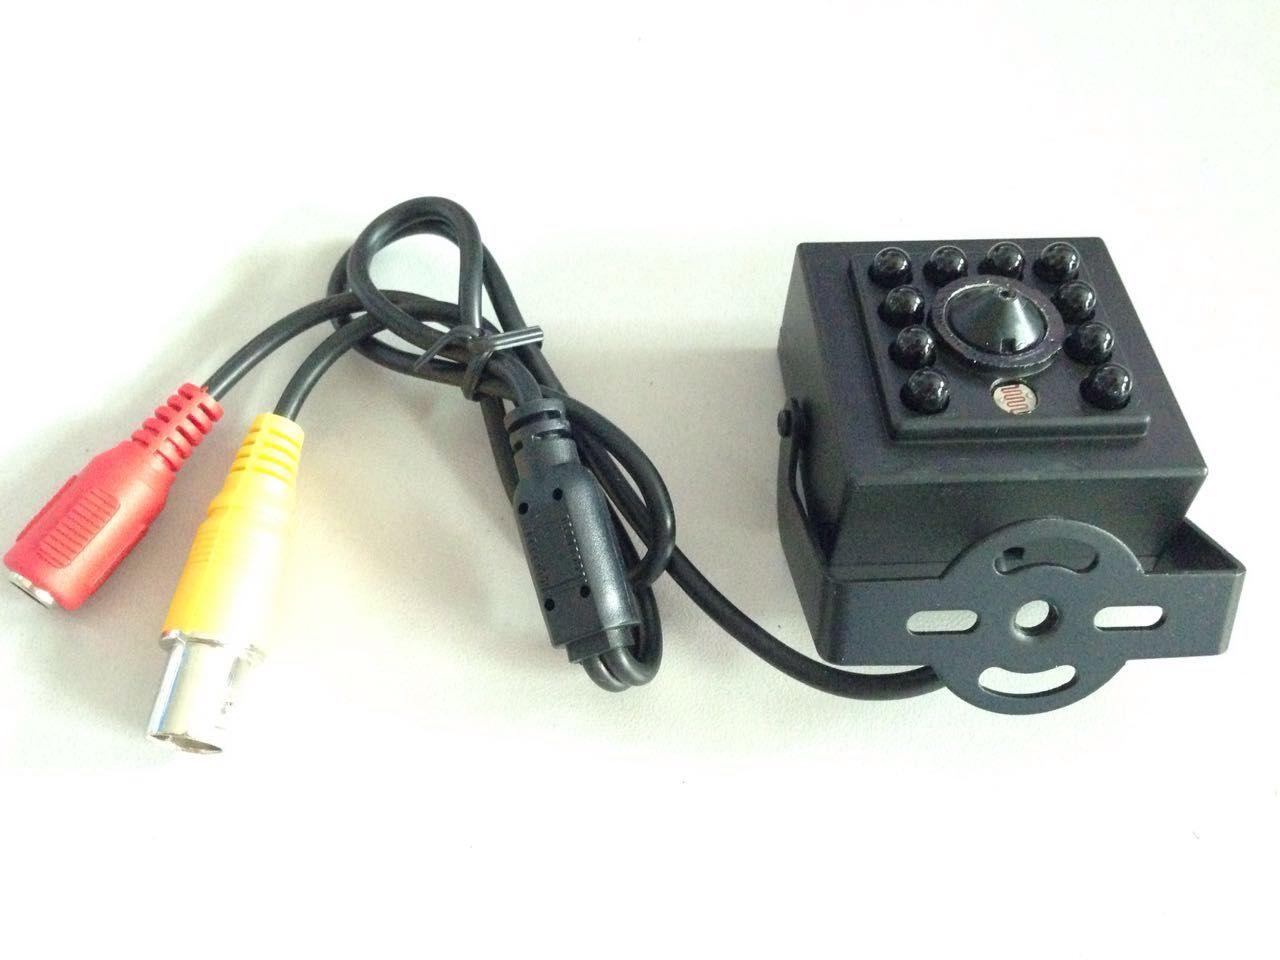 700TVL diminuta cámara ir 940nm, 1/3 '' cCD de sony, luz LED invisible de IR, lente de agujero de alfiler de 3.7mm